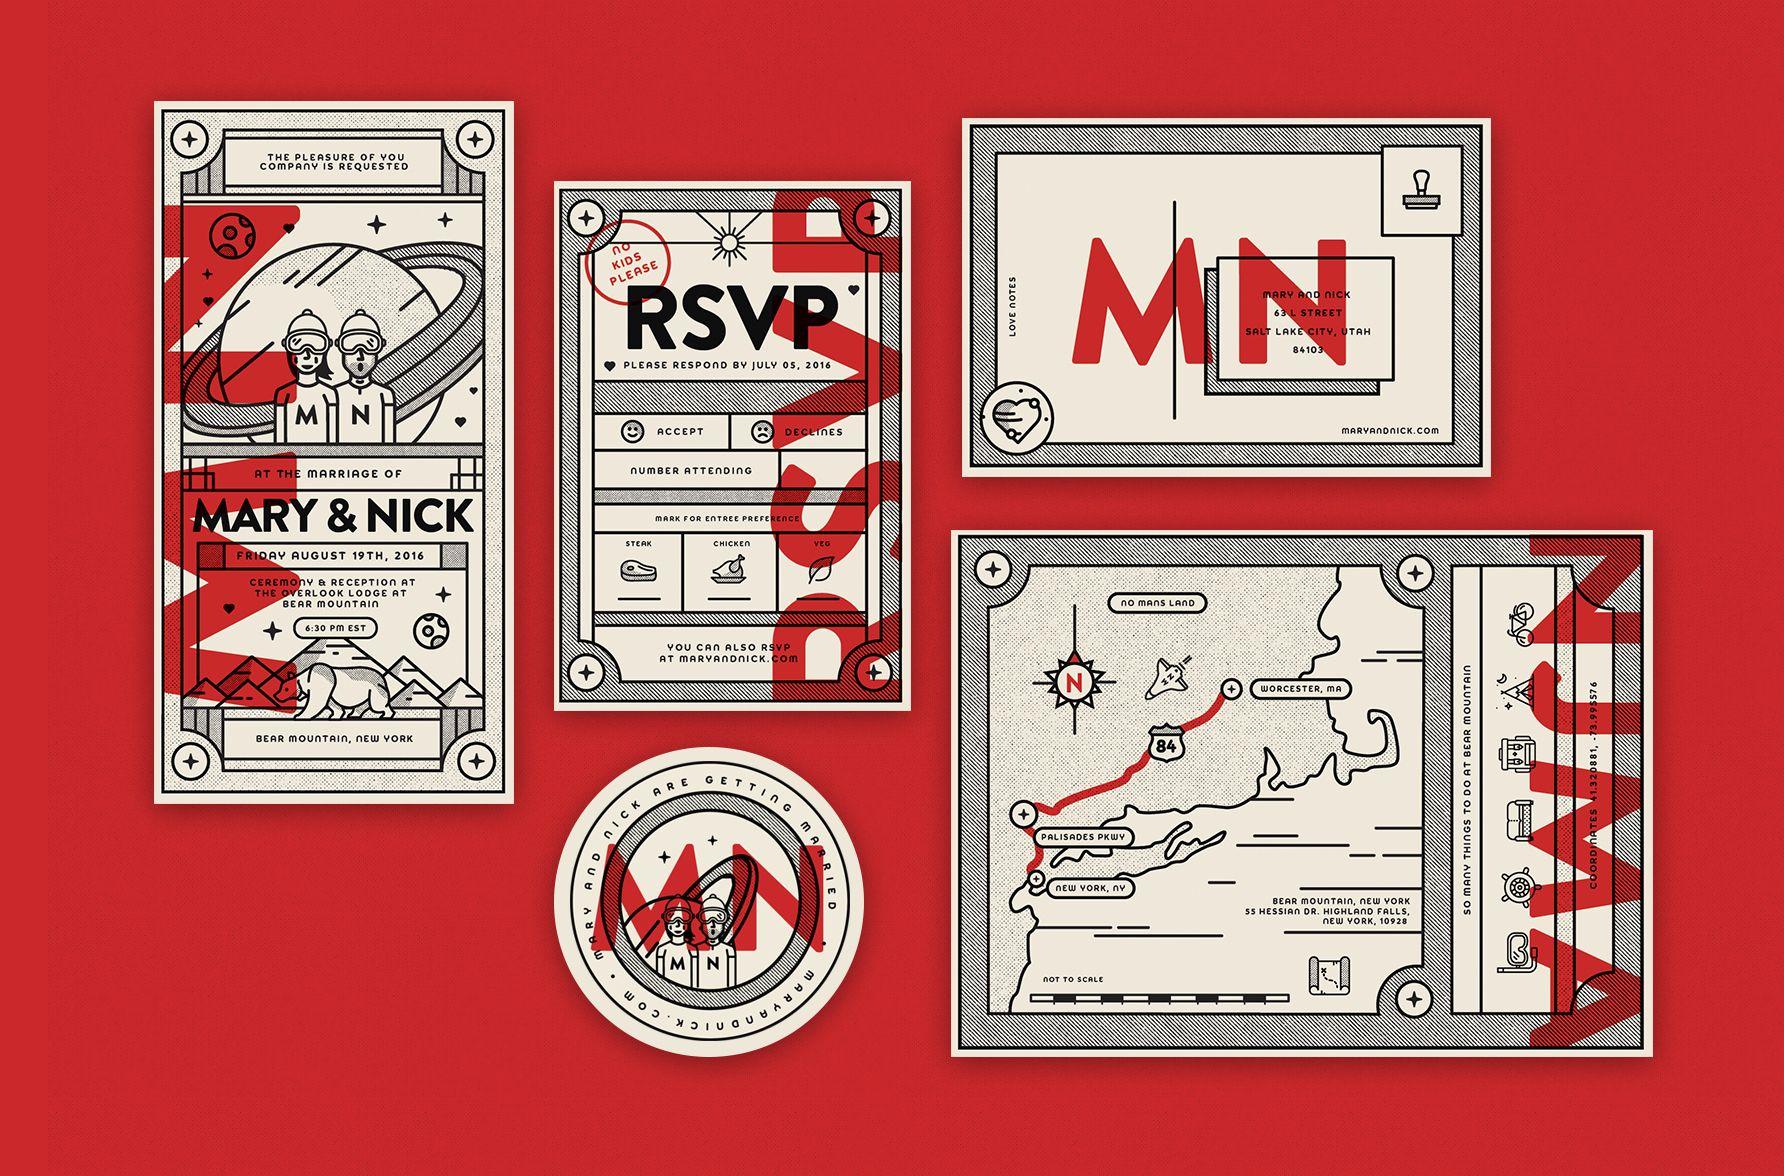 Pin by Richard Gooch on Graphic Design | Pinterest | Beautiful ...